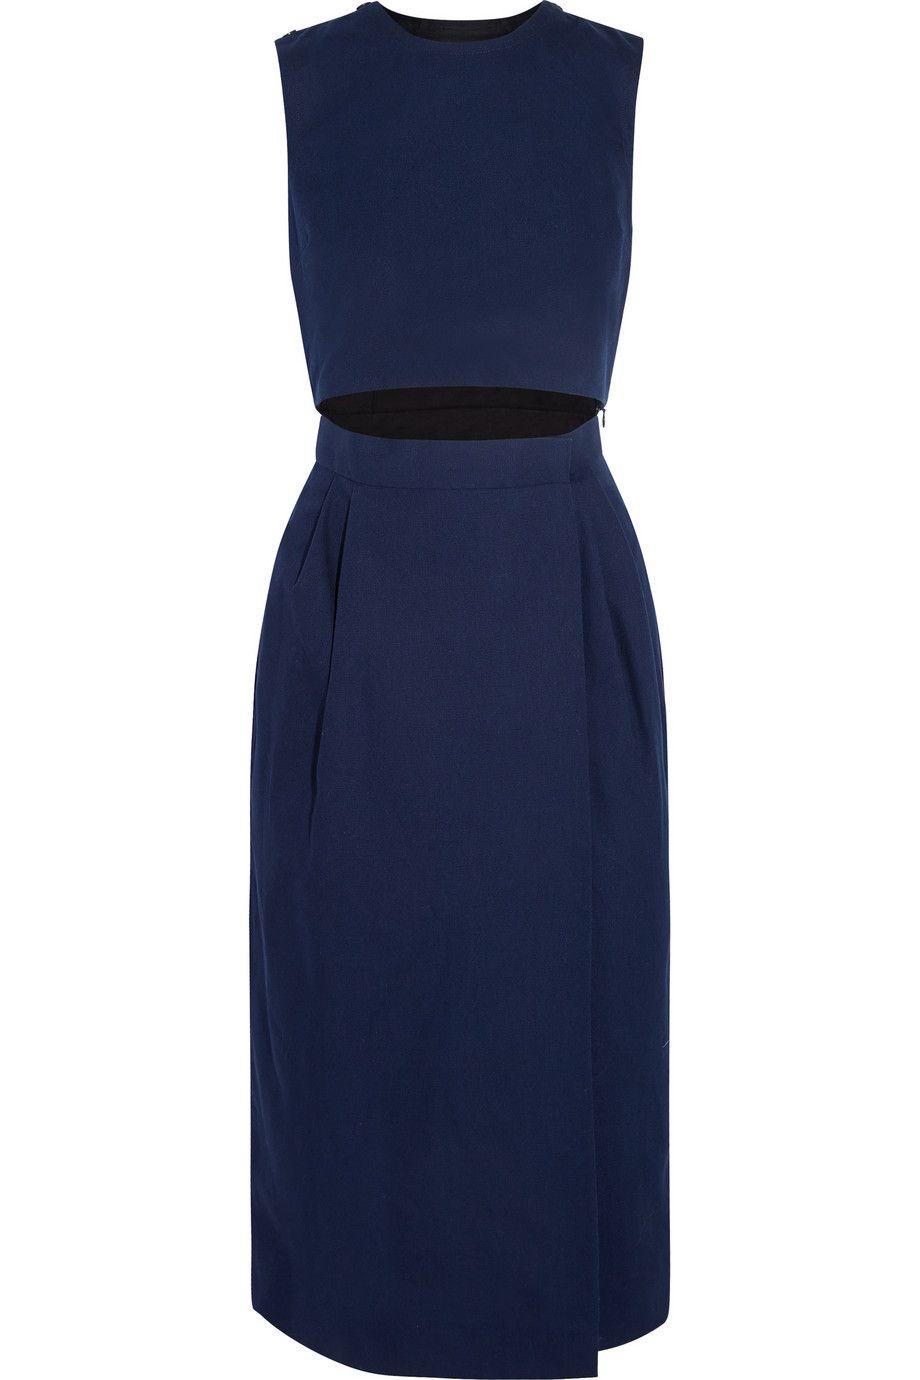 Storm Blue Cutout Cotton Canvas Midi Dress Victoria Victoria Beckham Designer Dress Sale Dresses Midi Dress [ 1380 x 920 Pixel ]